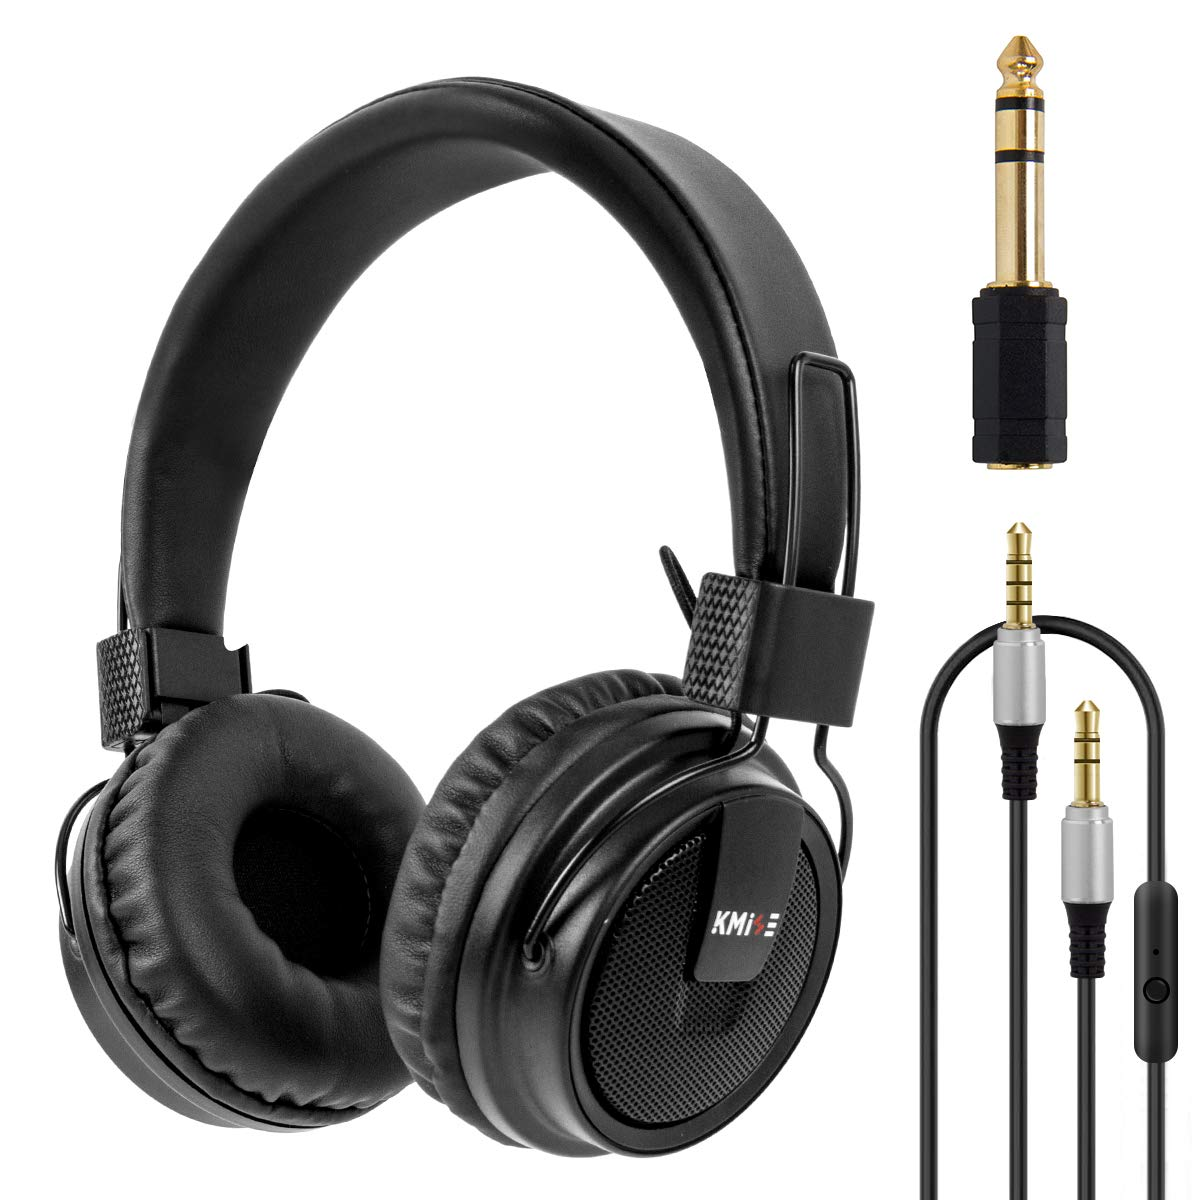 Headphones Headset Foldable Over Ear Earphones